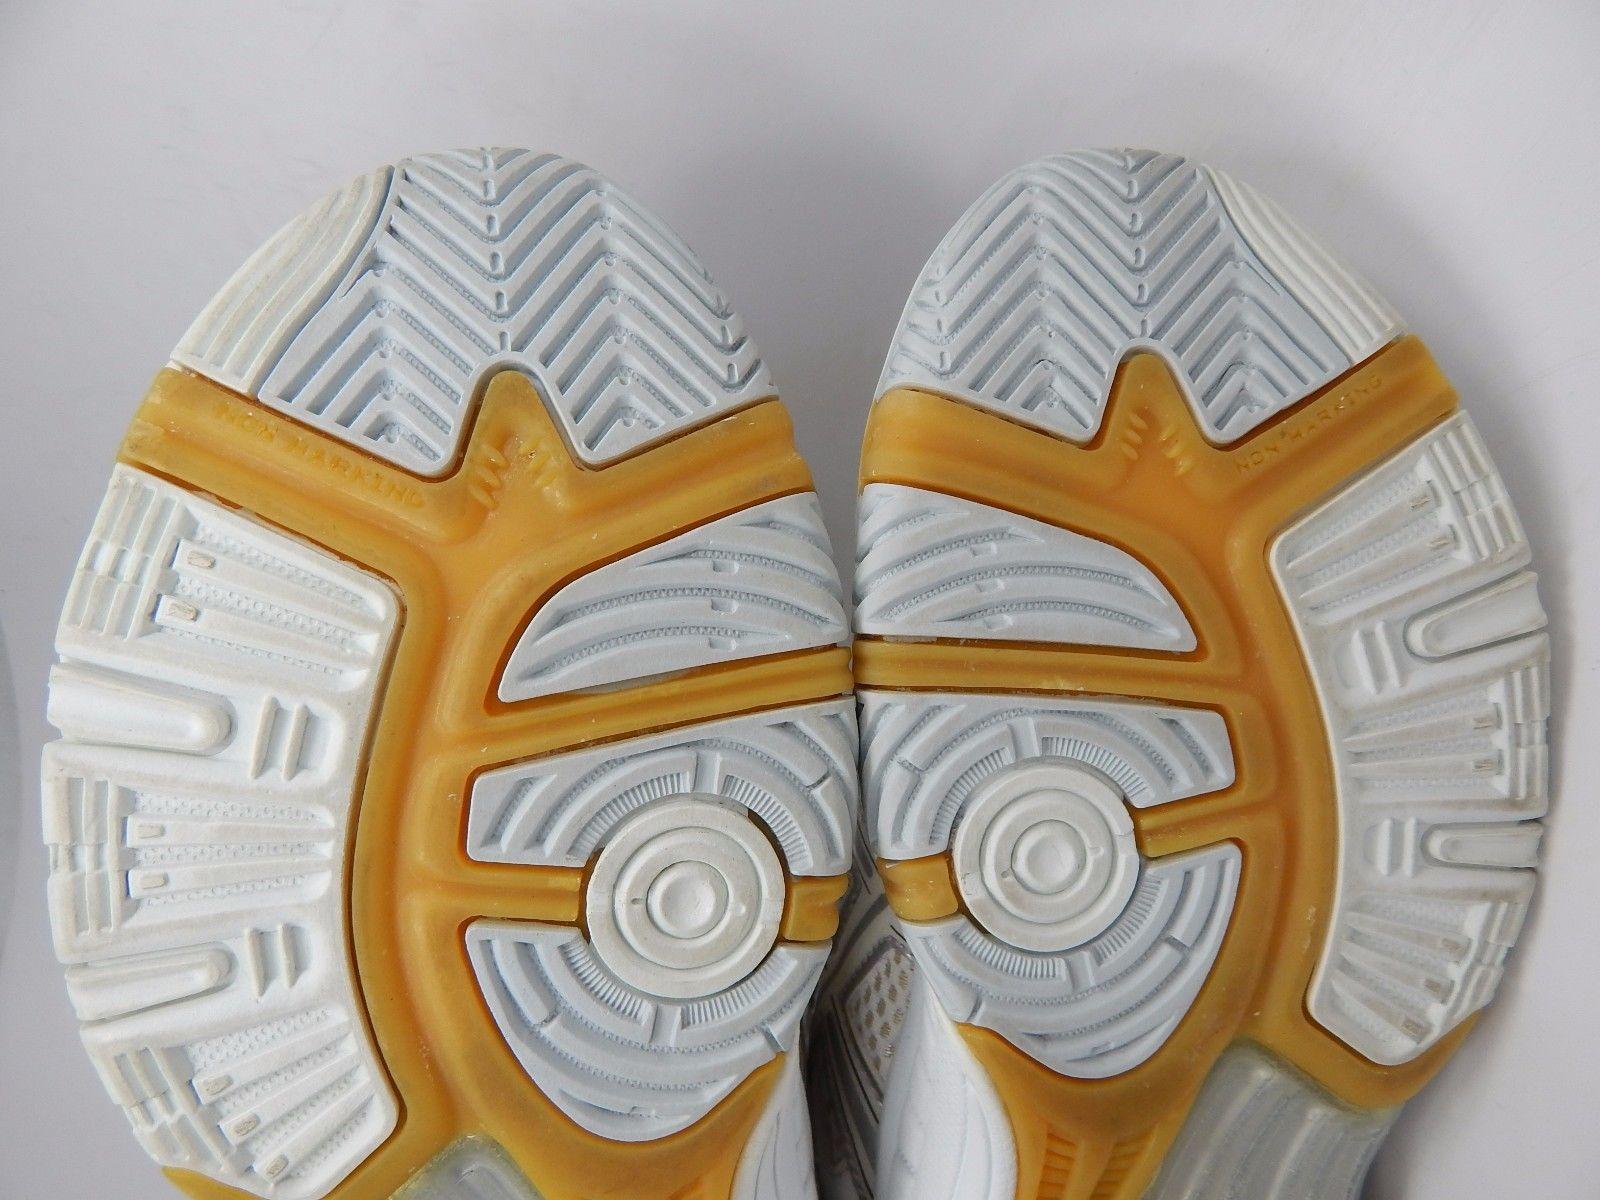 Asics Gel Rocket 5 Women's Volleyball Shoes Size US 8 M (B) EU 39.5 White B053N